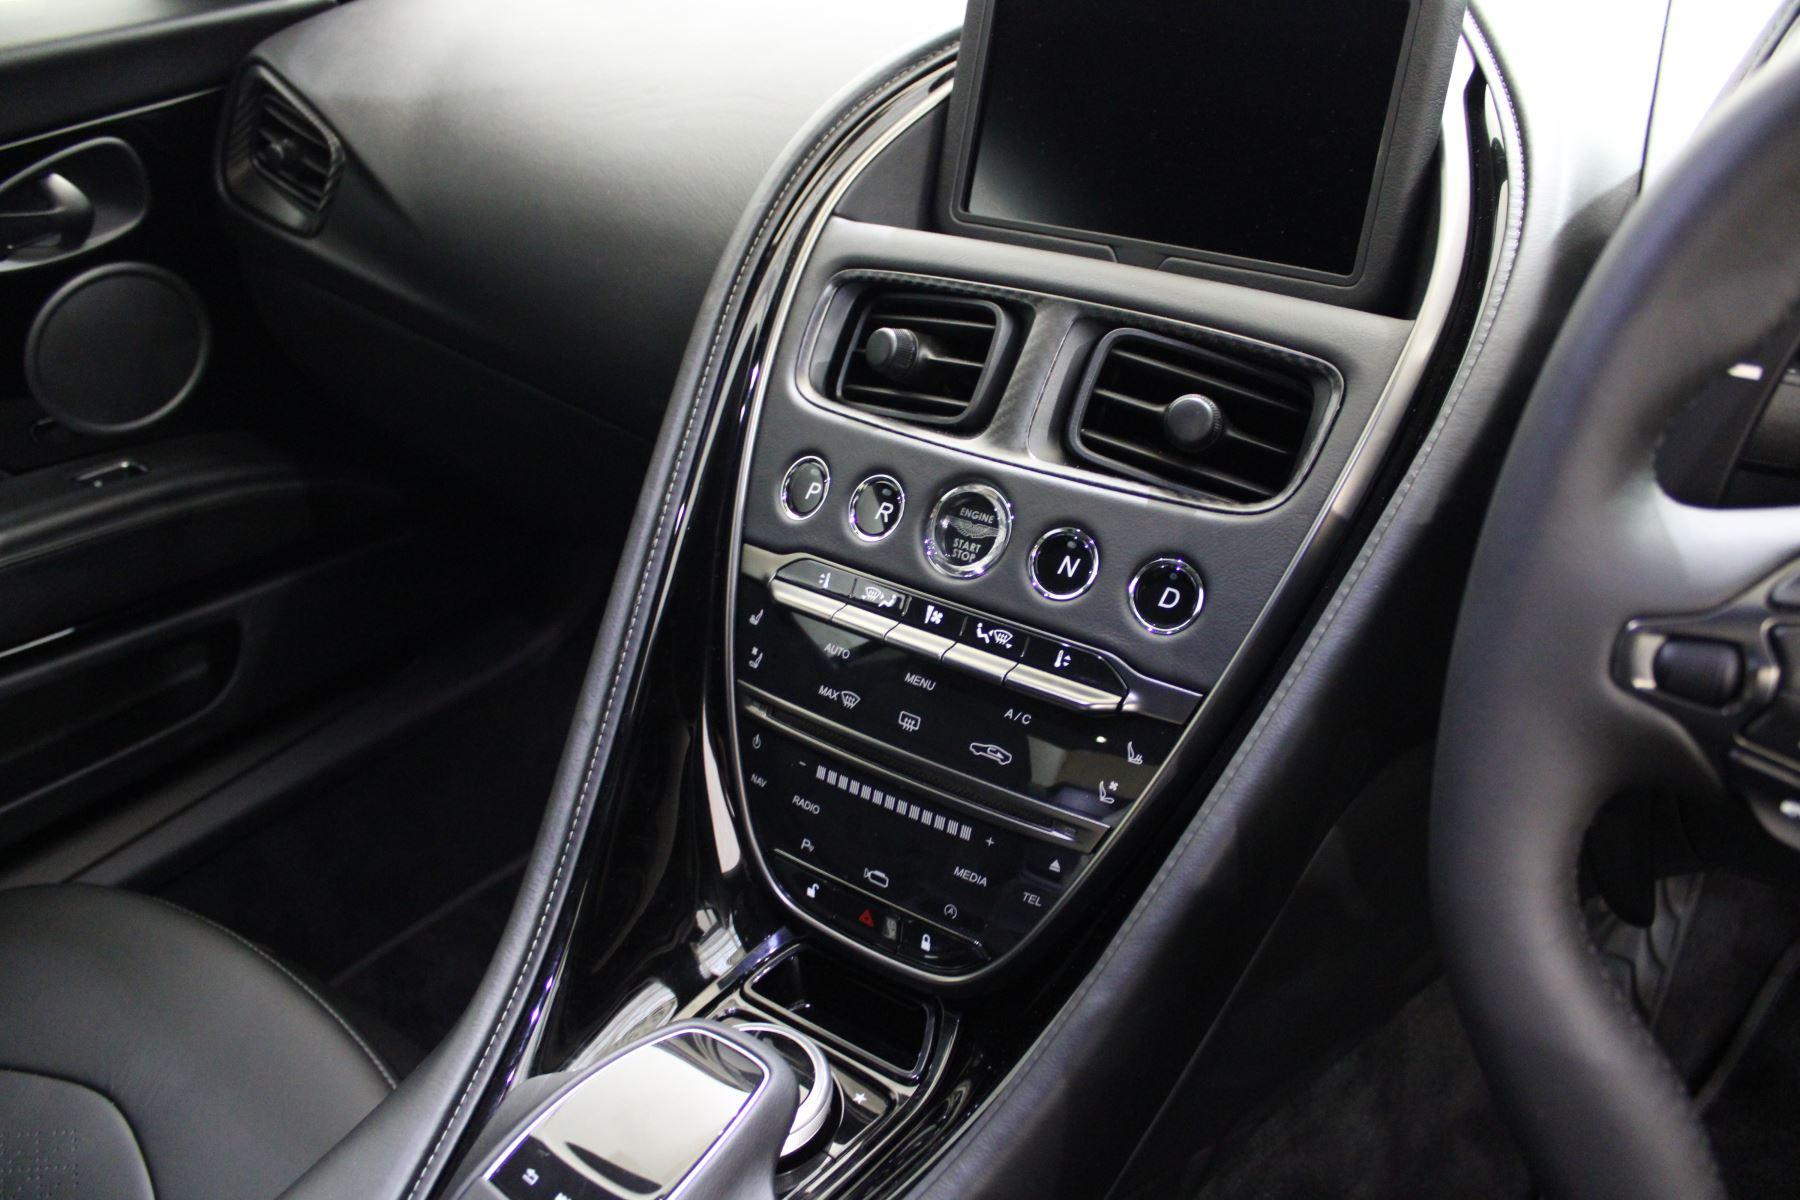 Aston Martin DBS V12 Superleggera 2dr Touchtronic image 32